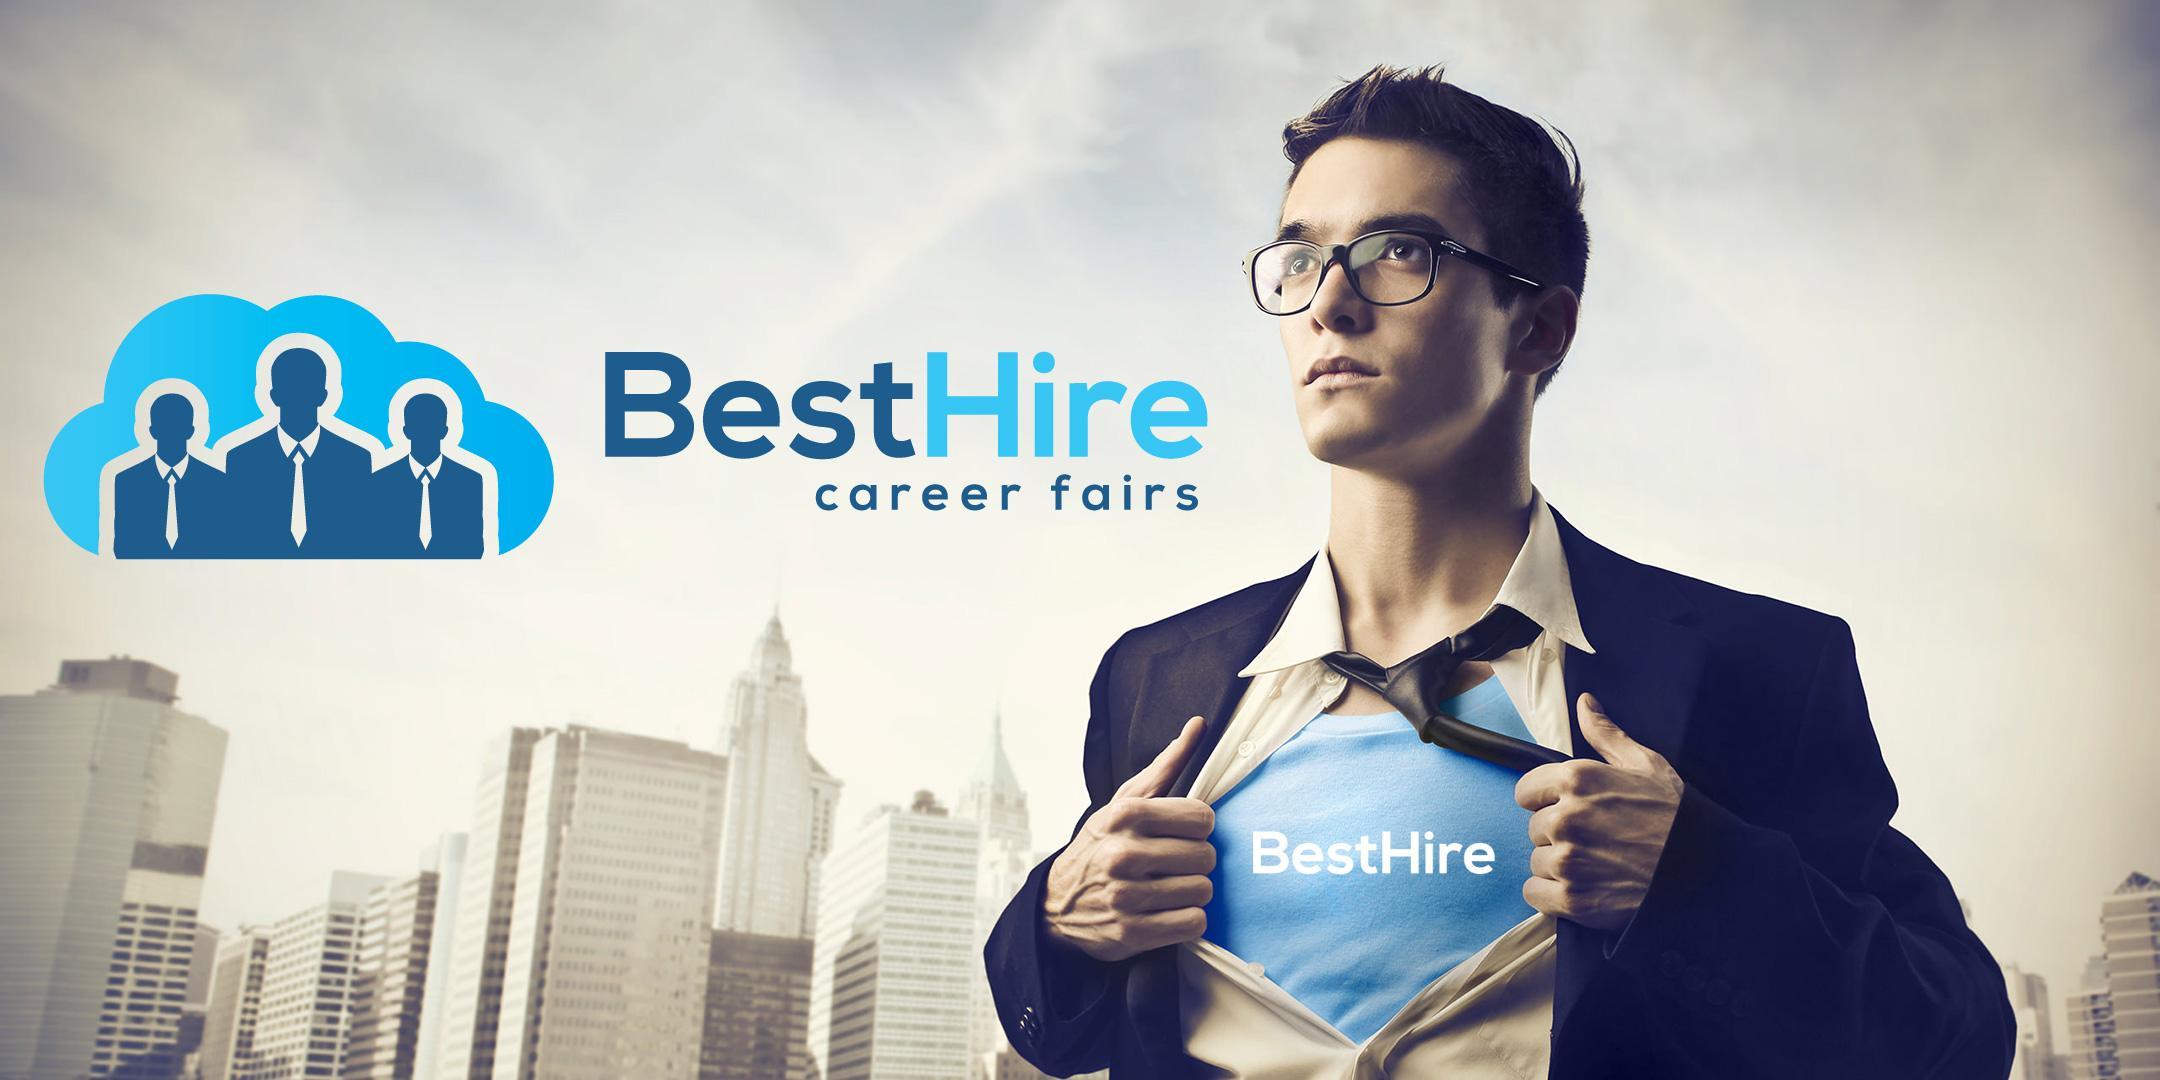 Dallas Career Fair - June 8, 2017 Job Fairs & Hiring Events in Dallas TX